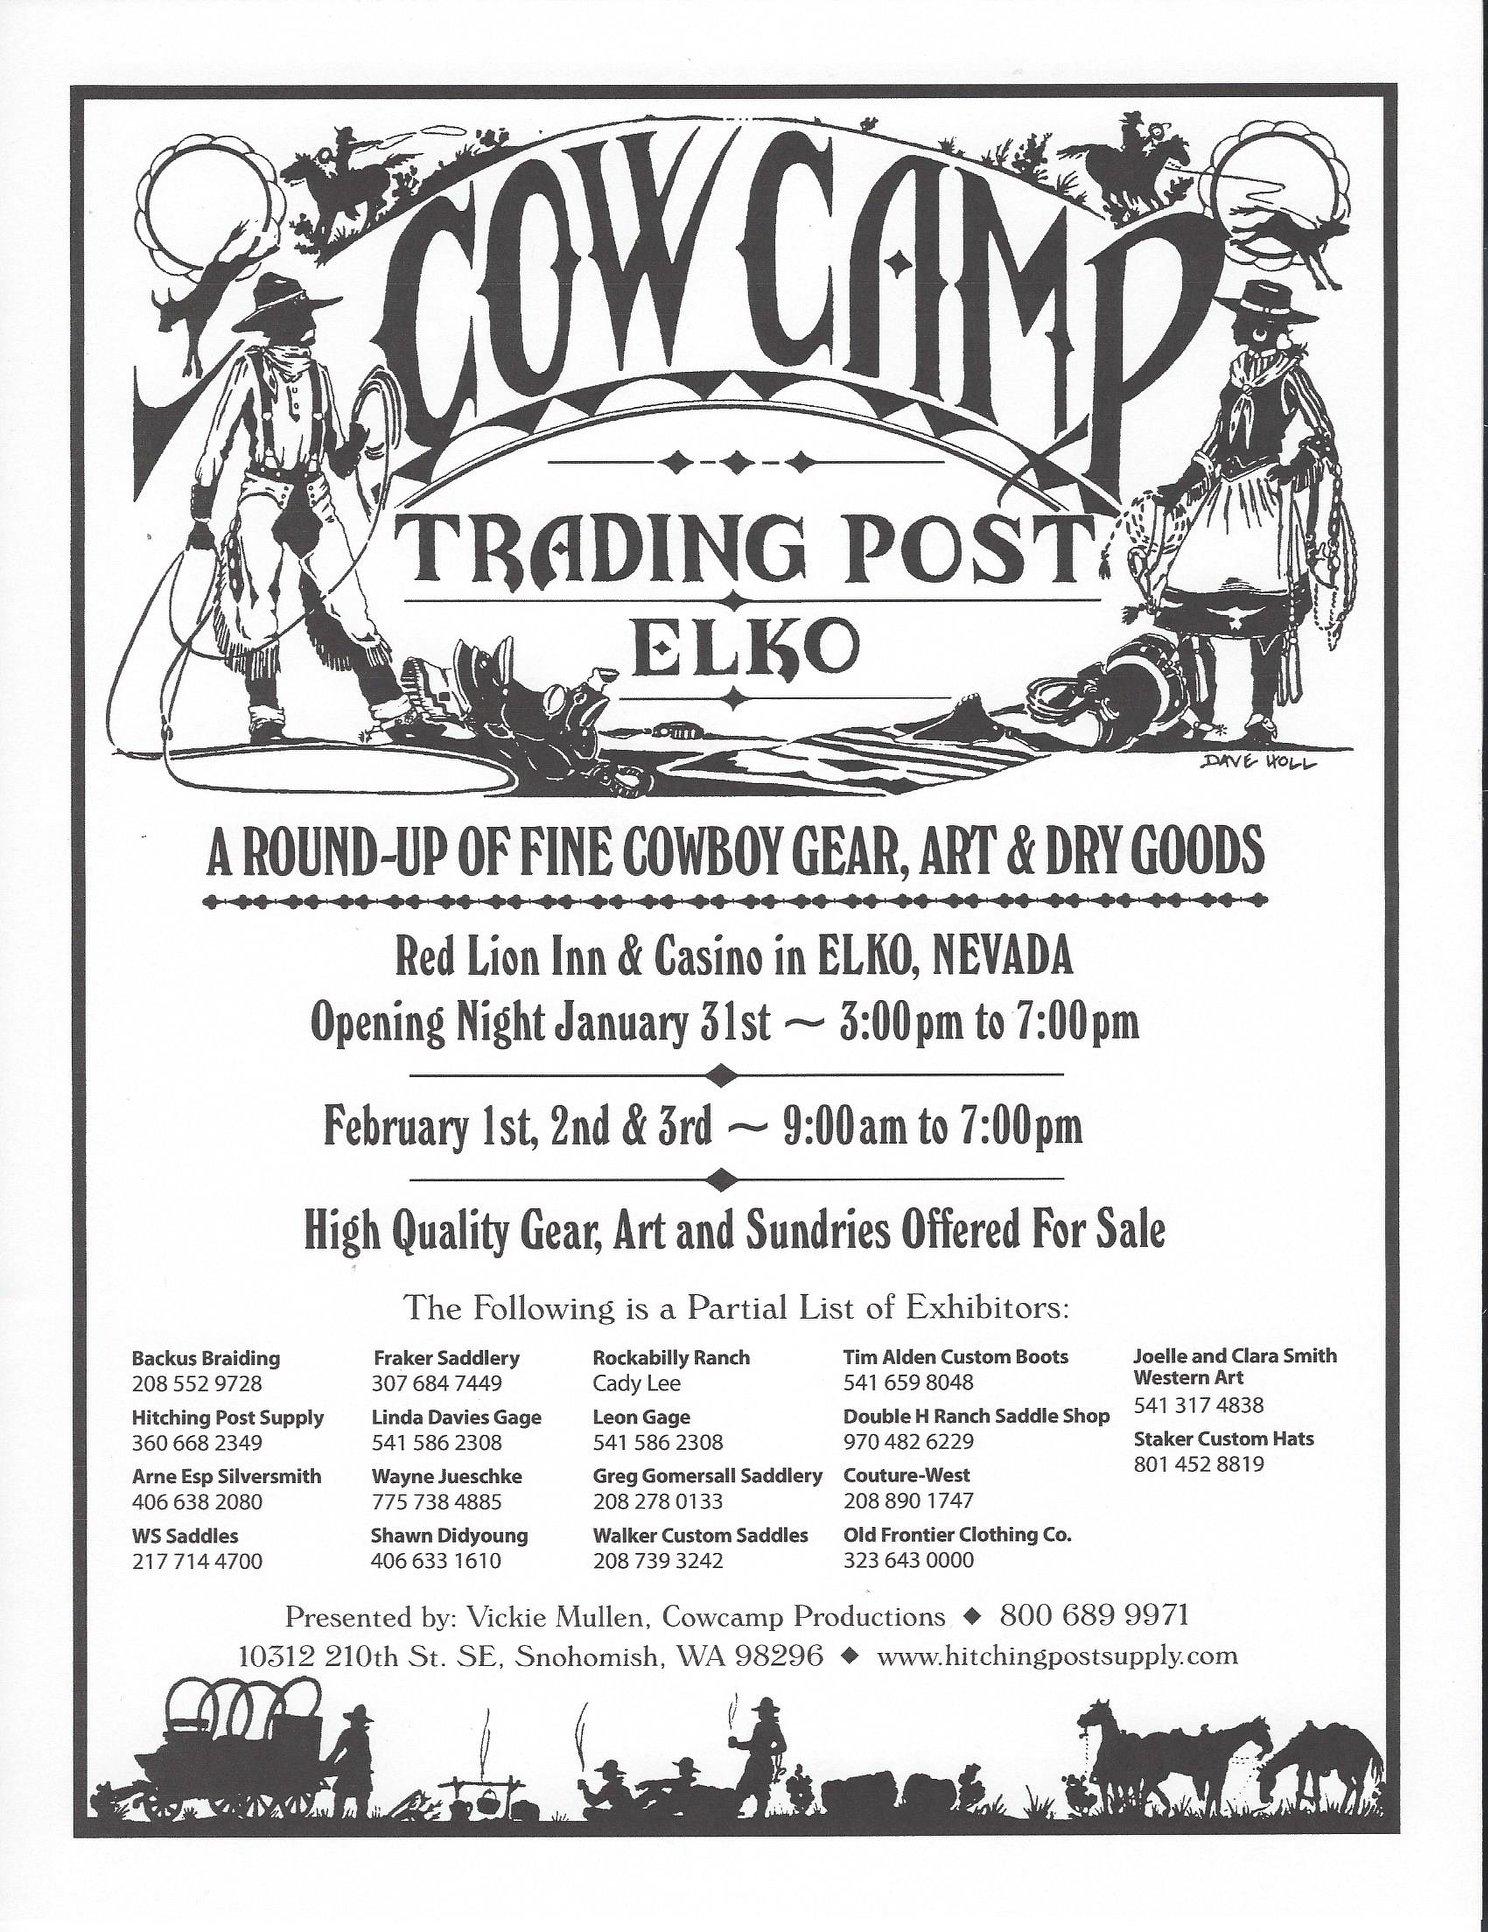 Cowcamp Trading Post - WS Saddles Coeur d'Alene, ID   Call